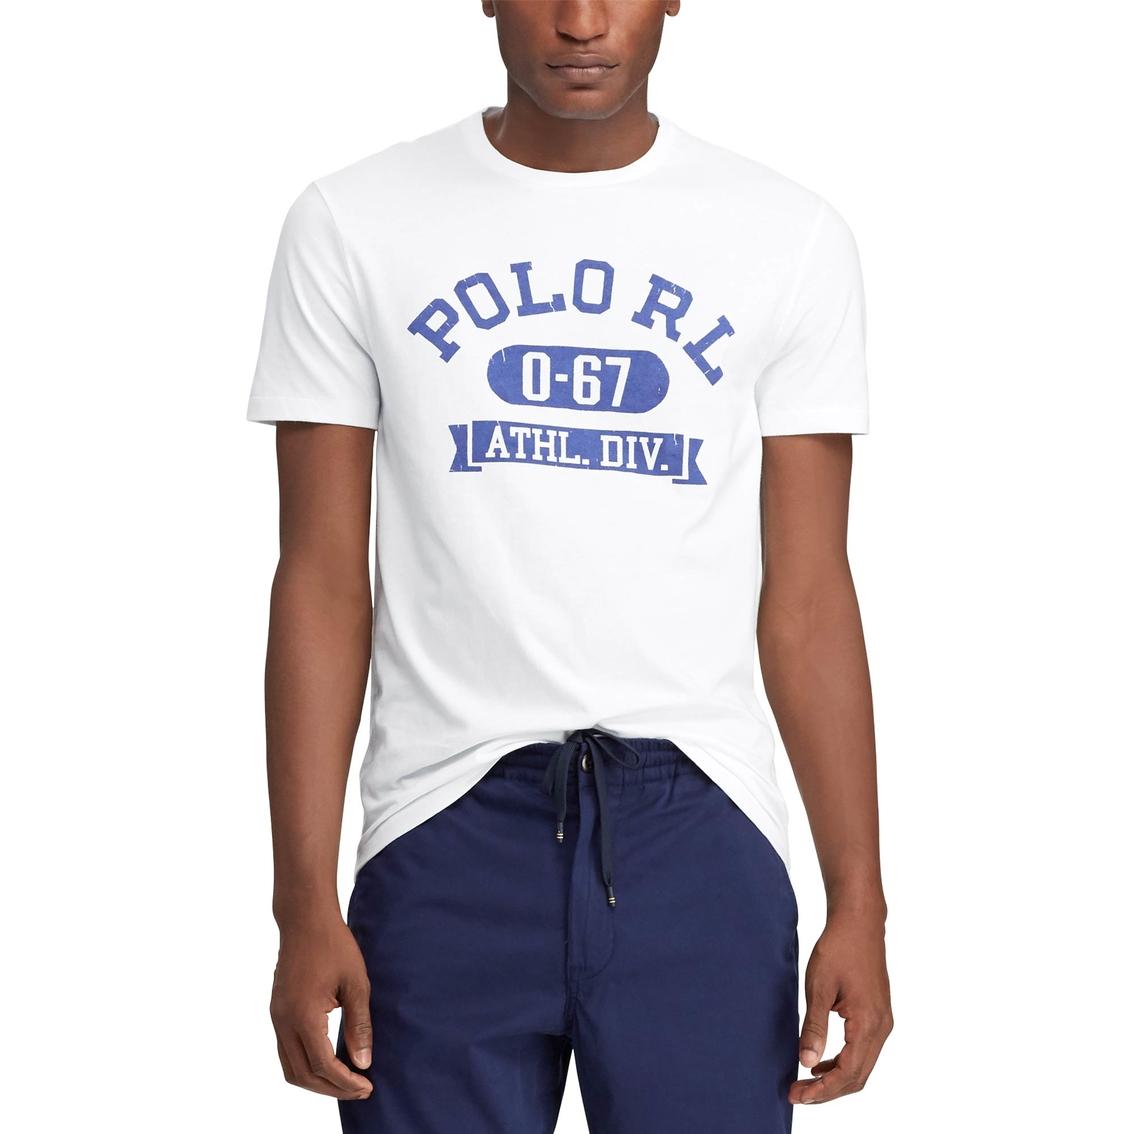 f53c484c0c Polo Ralph Lauren Custom Slim Fit Graphic Tee | T-shirts | Apparel ...